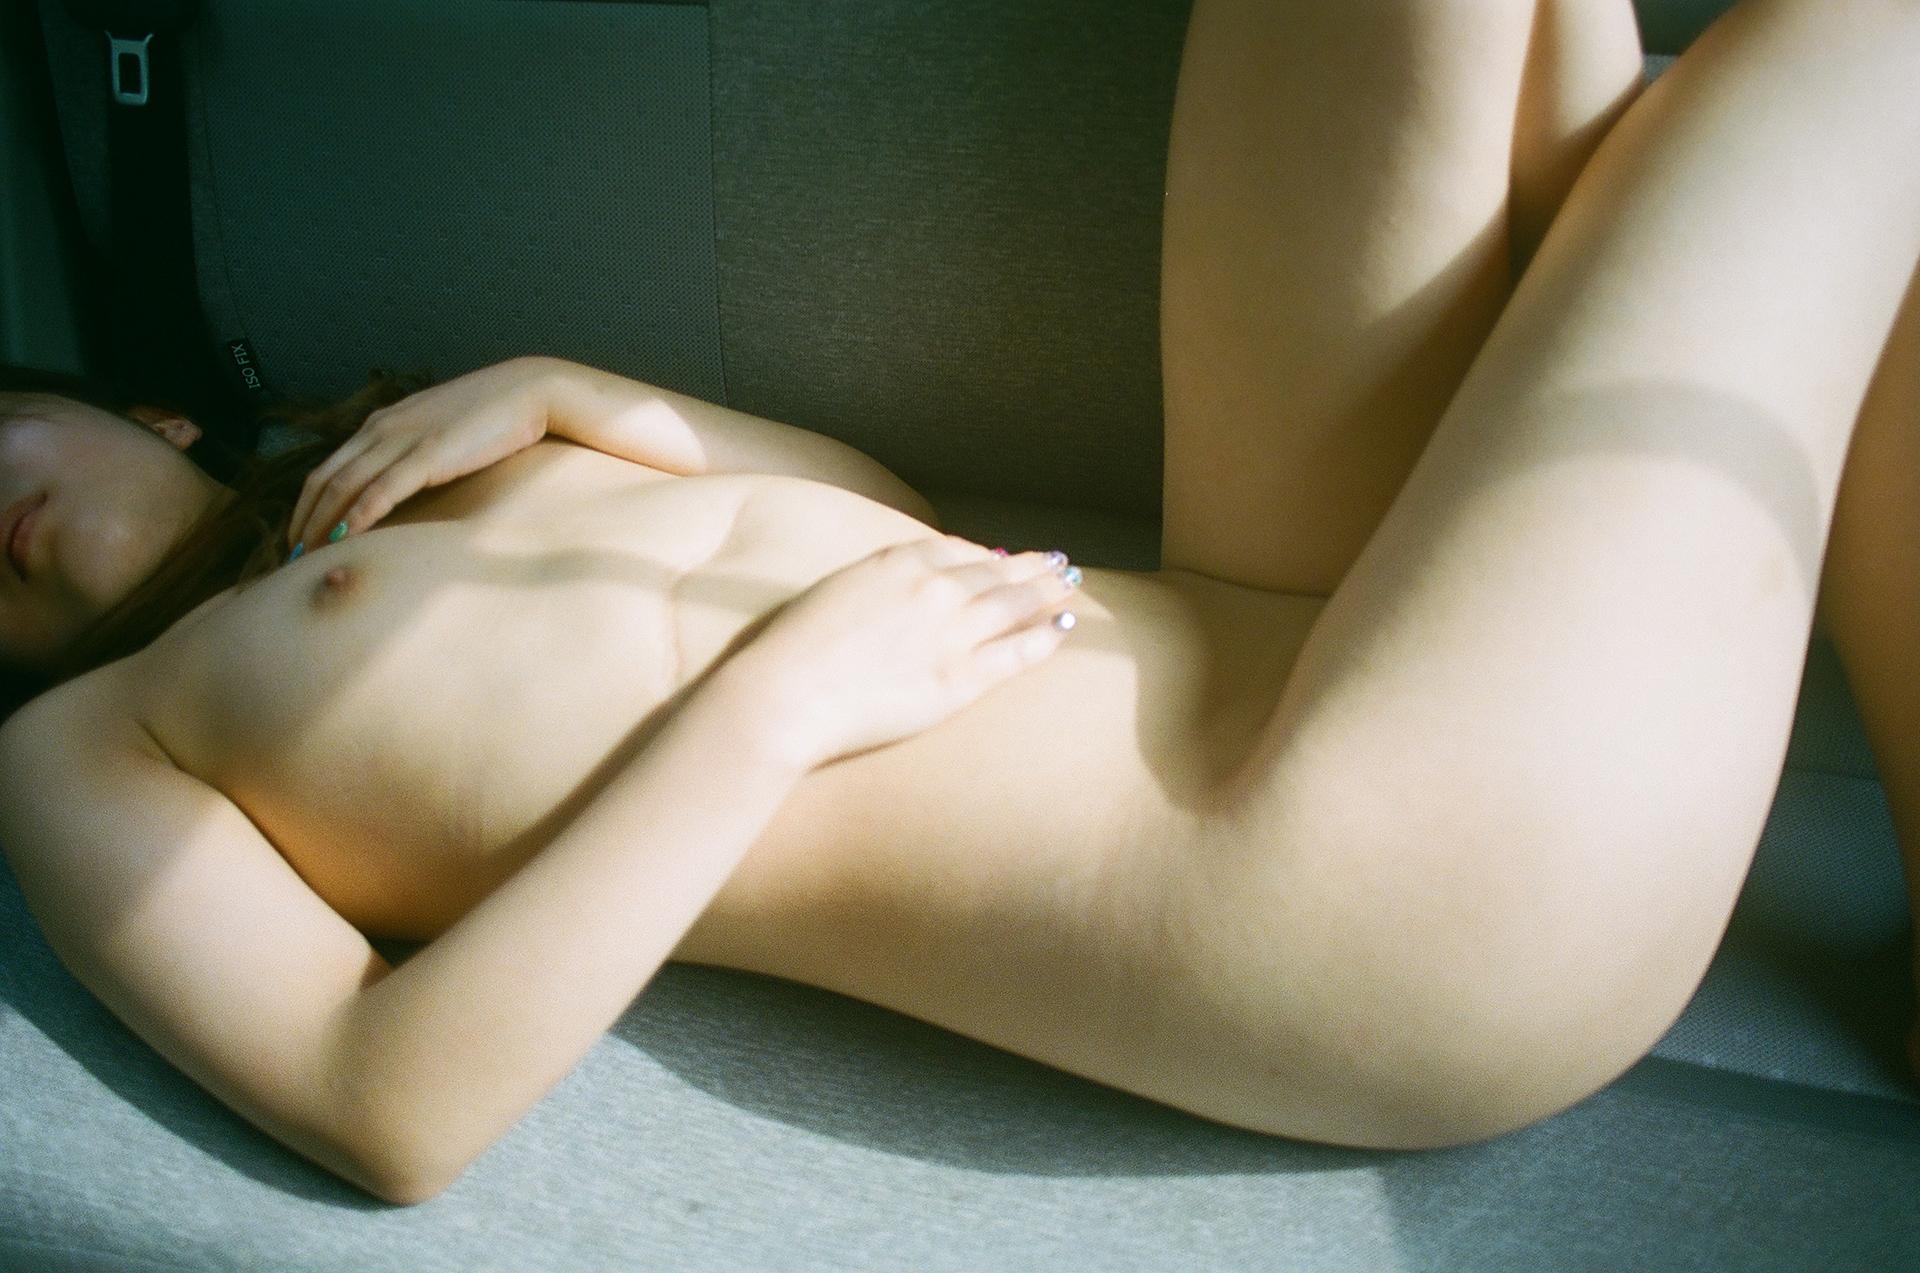 倉島 周平 | Shuhei Kurashima